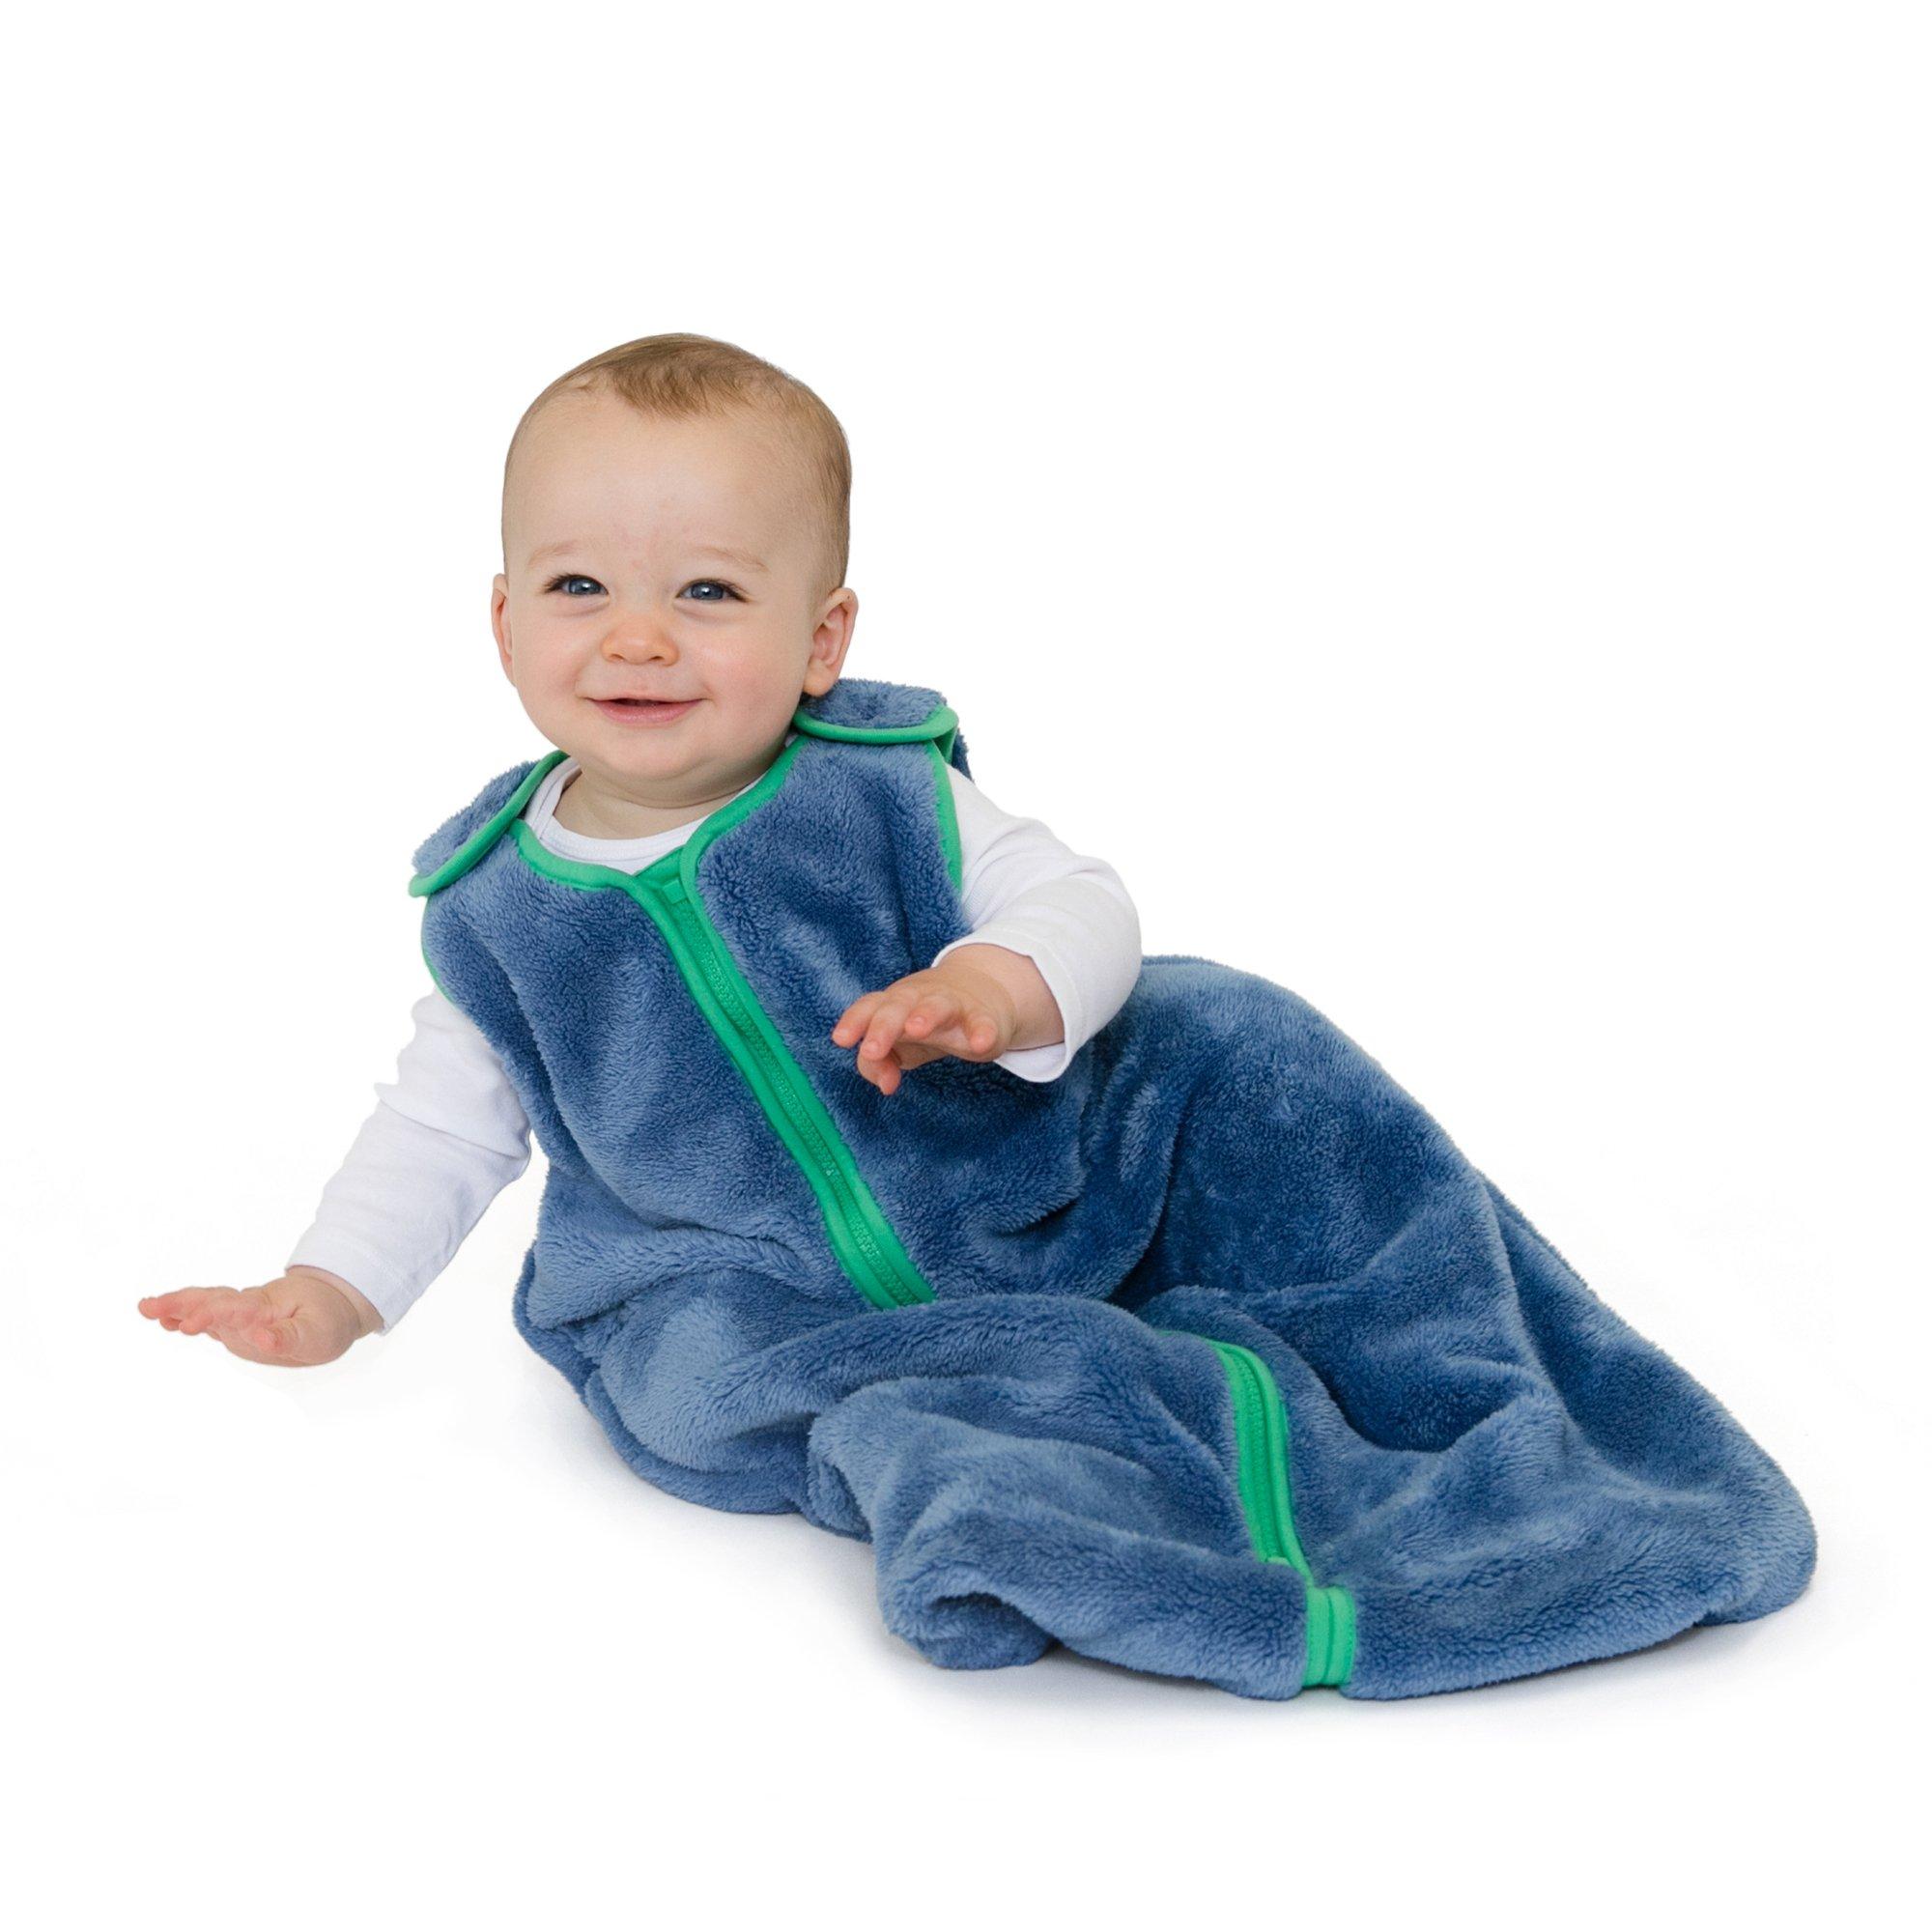 baby deedee Sleep Nest Teddy Baby Sleeping Bag, Fuzzy Dino, Large (18-36 Months) by baby deedee